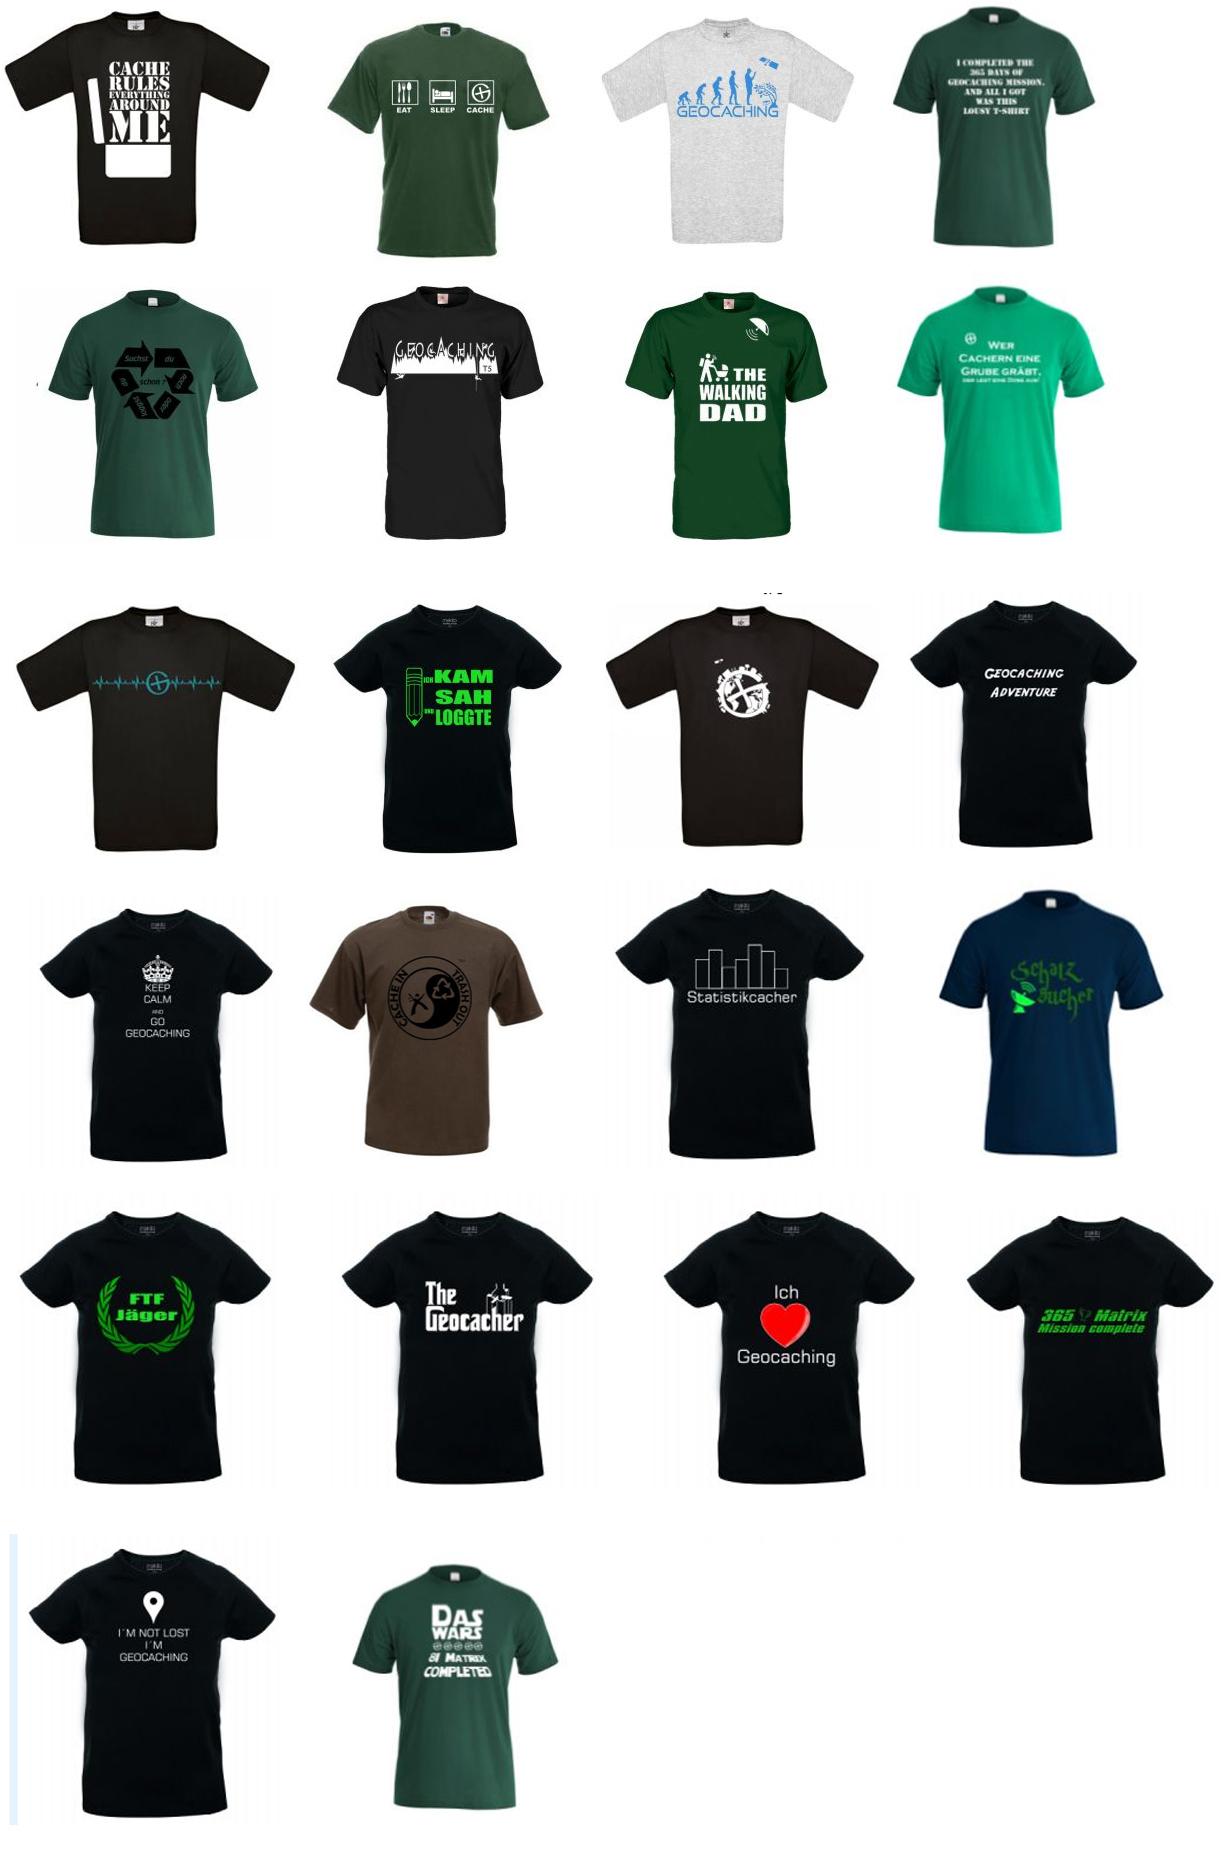 alle_geocaching_shirt